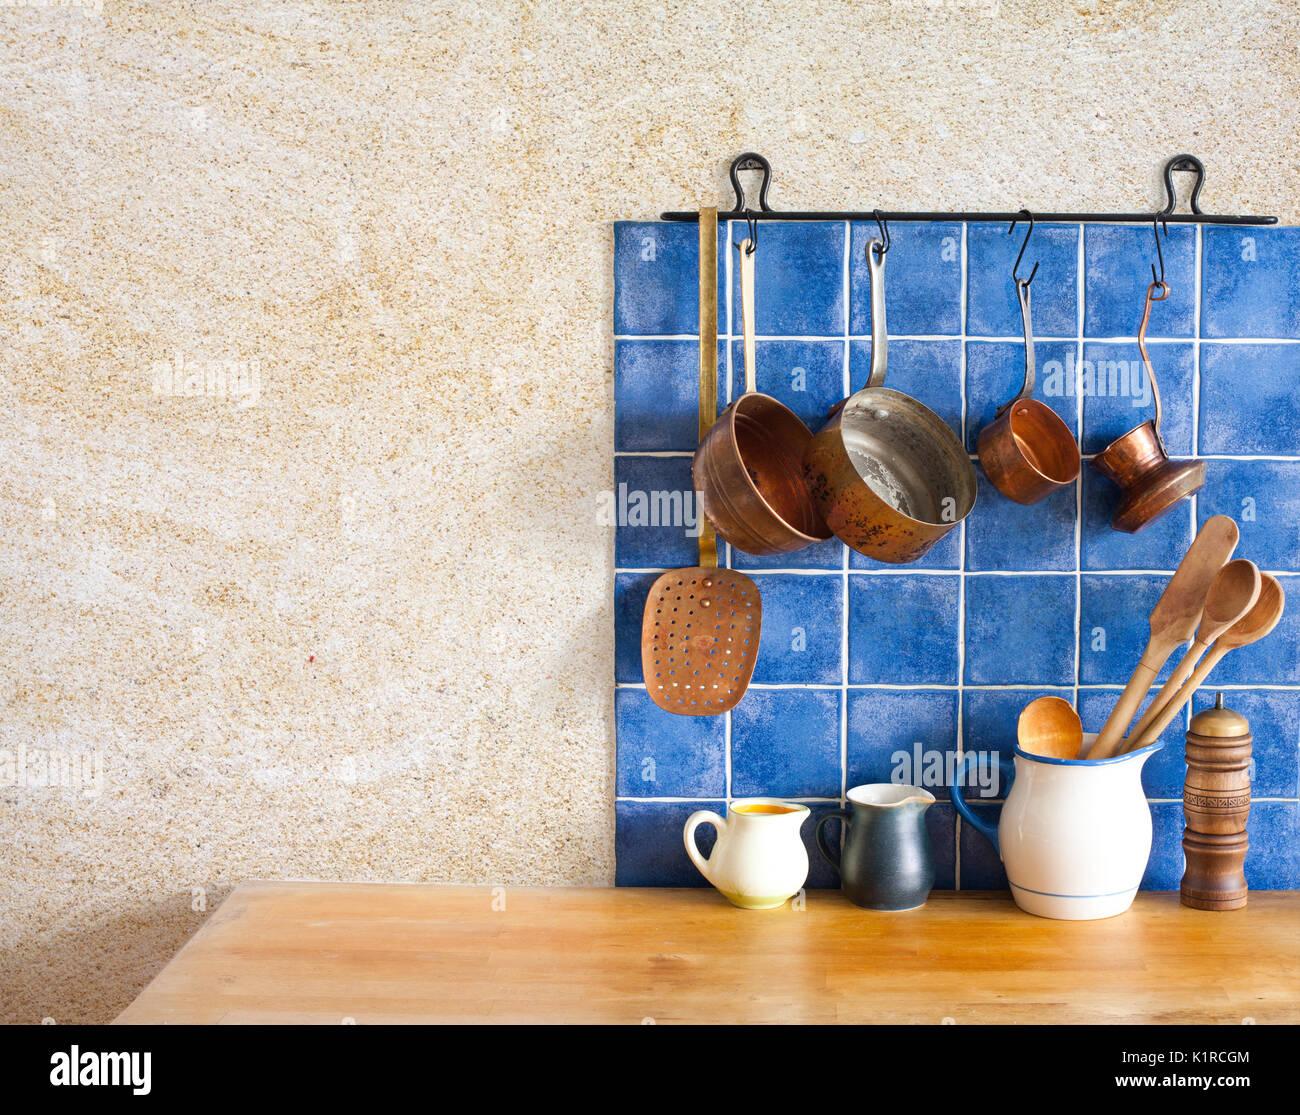 Hanging Copper Pans Stockfotos & Hanging Copper Pans Bilder - Alamy